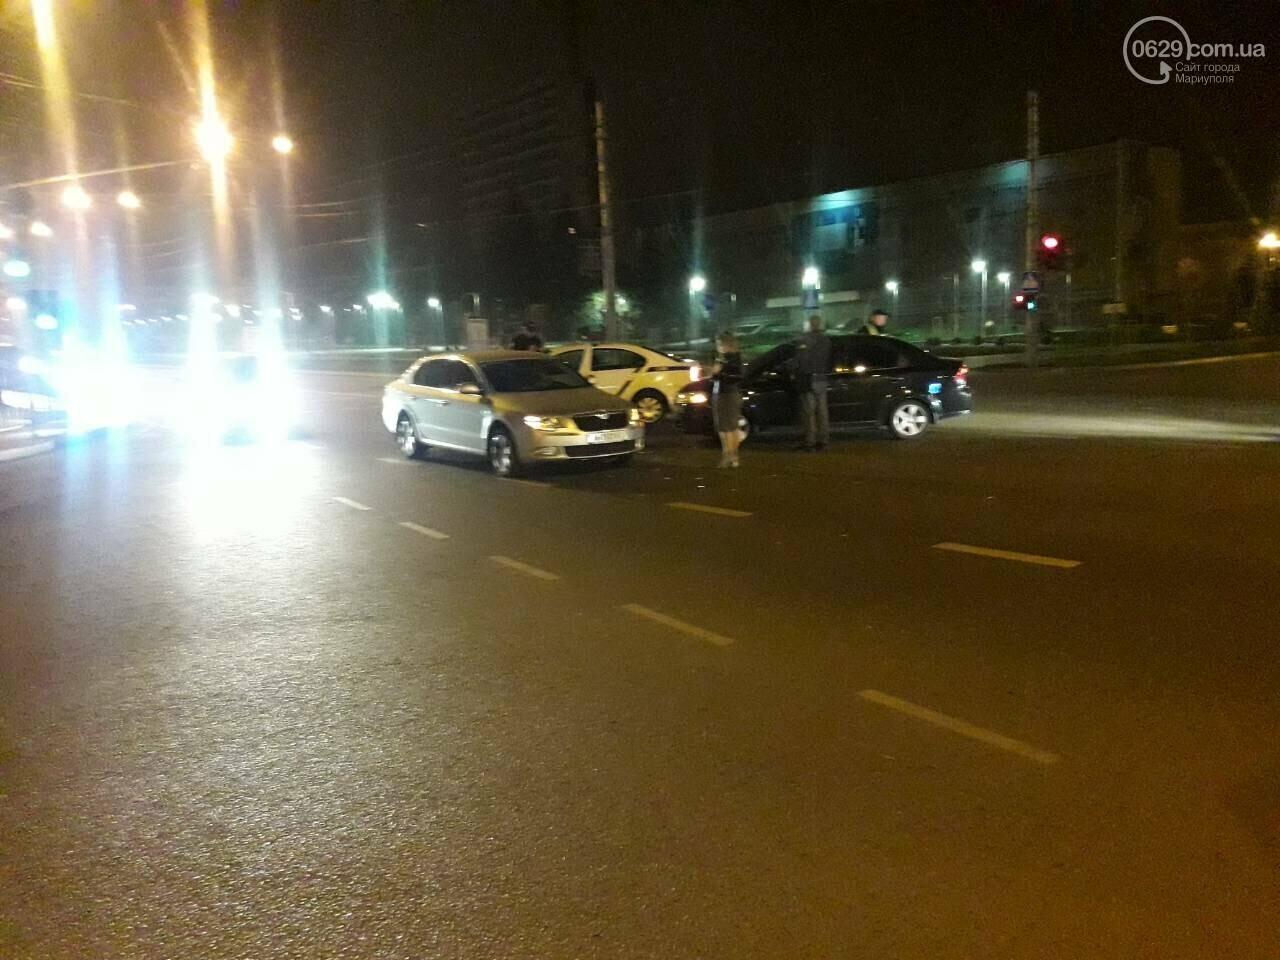 В центре Мариуполя столкнулись два автомобиля, — ФОТО, фото-2